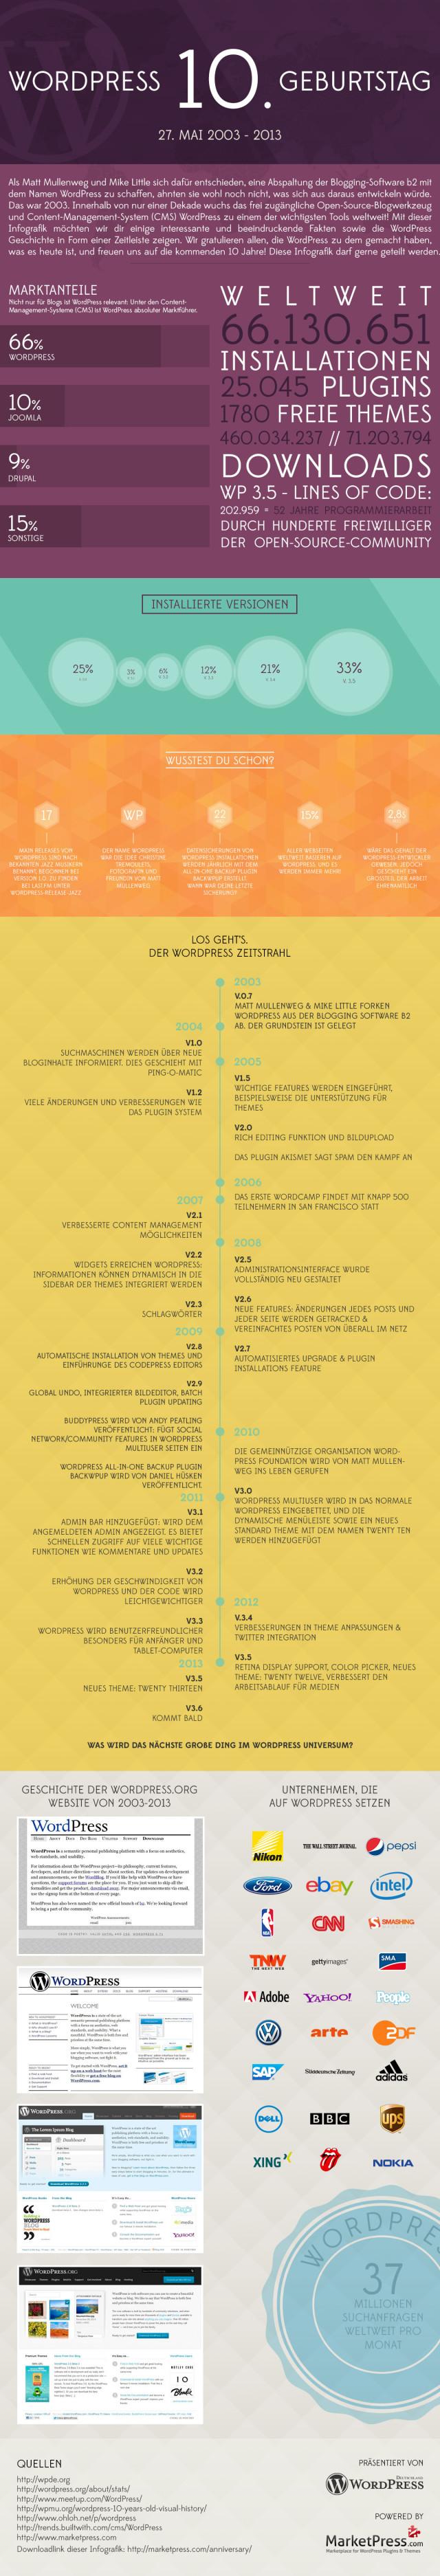 10_Jahre_WordPress_Infografik_powered_by MarketPress.com